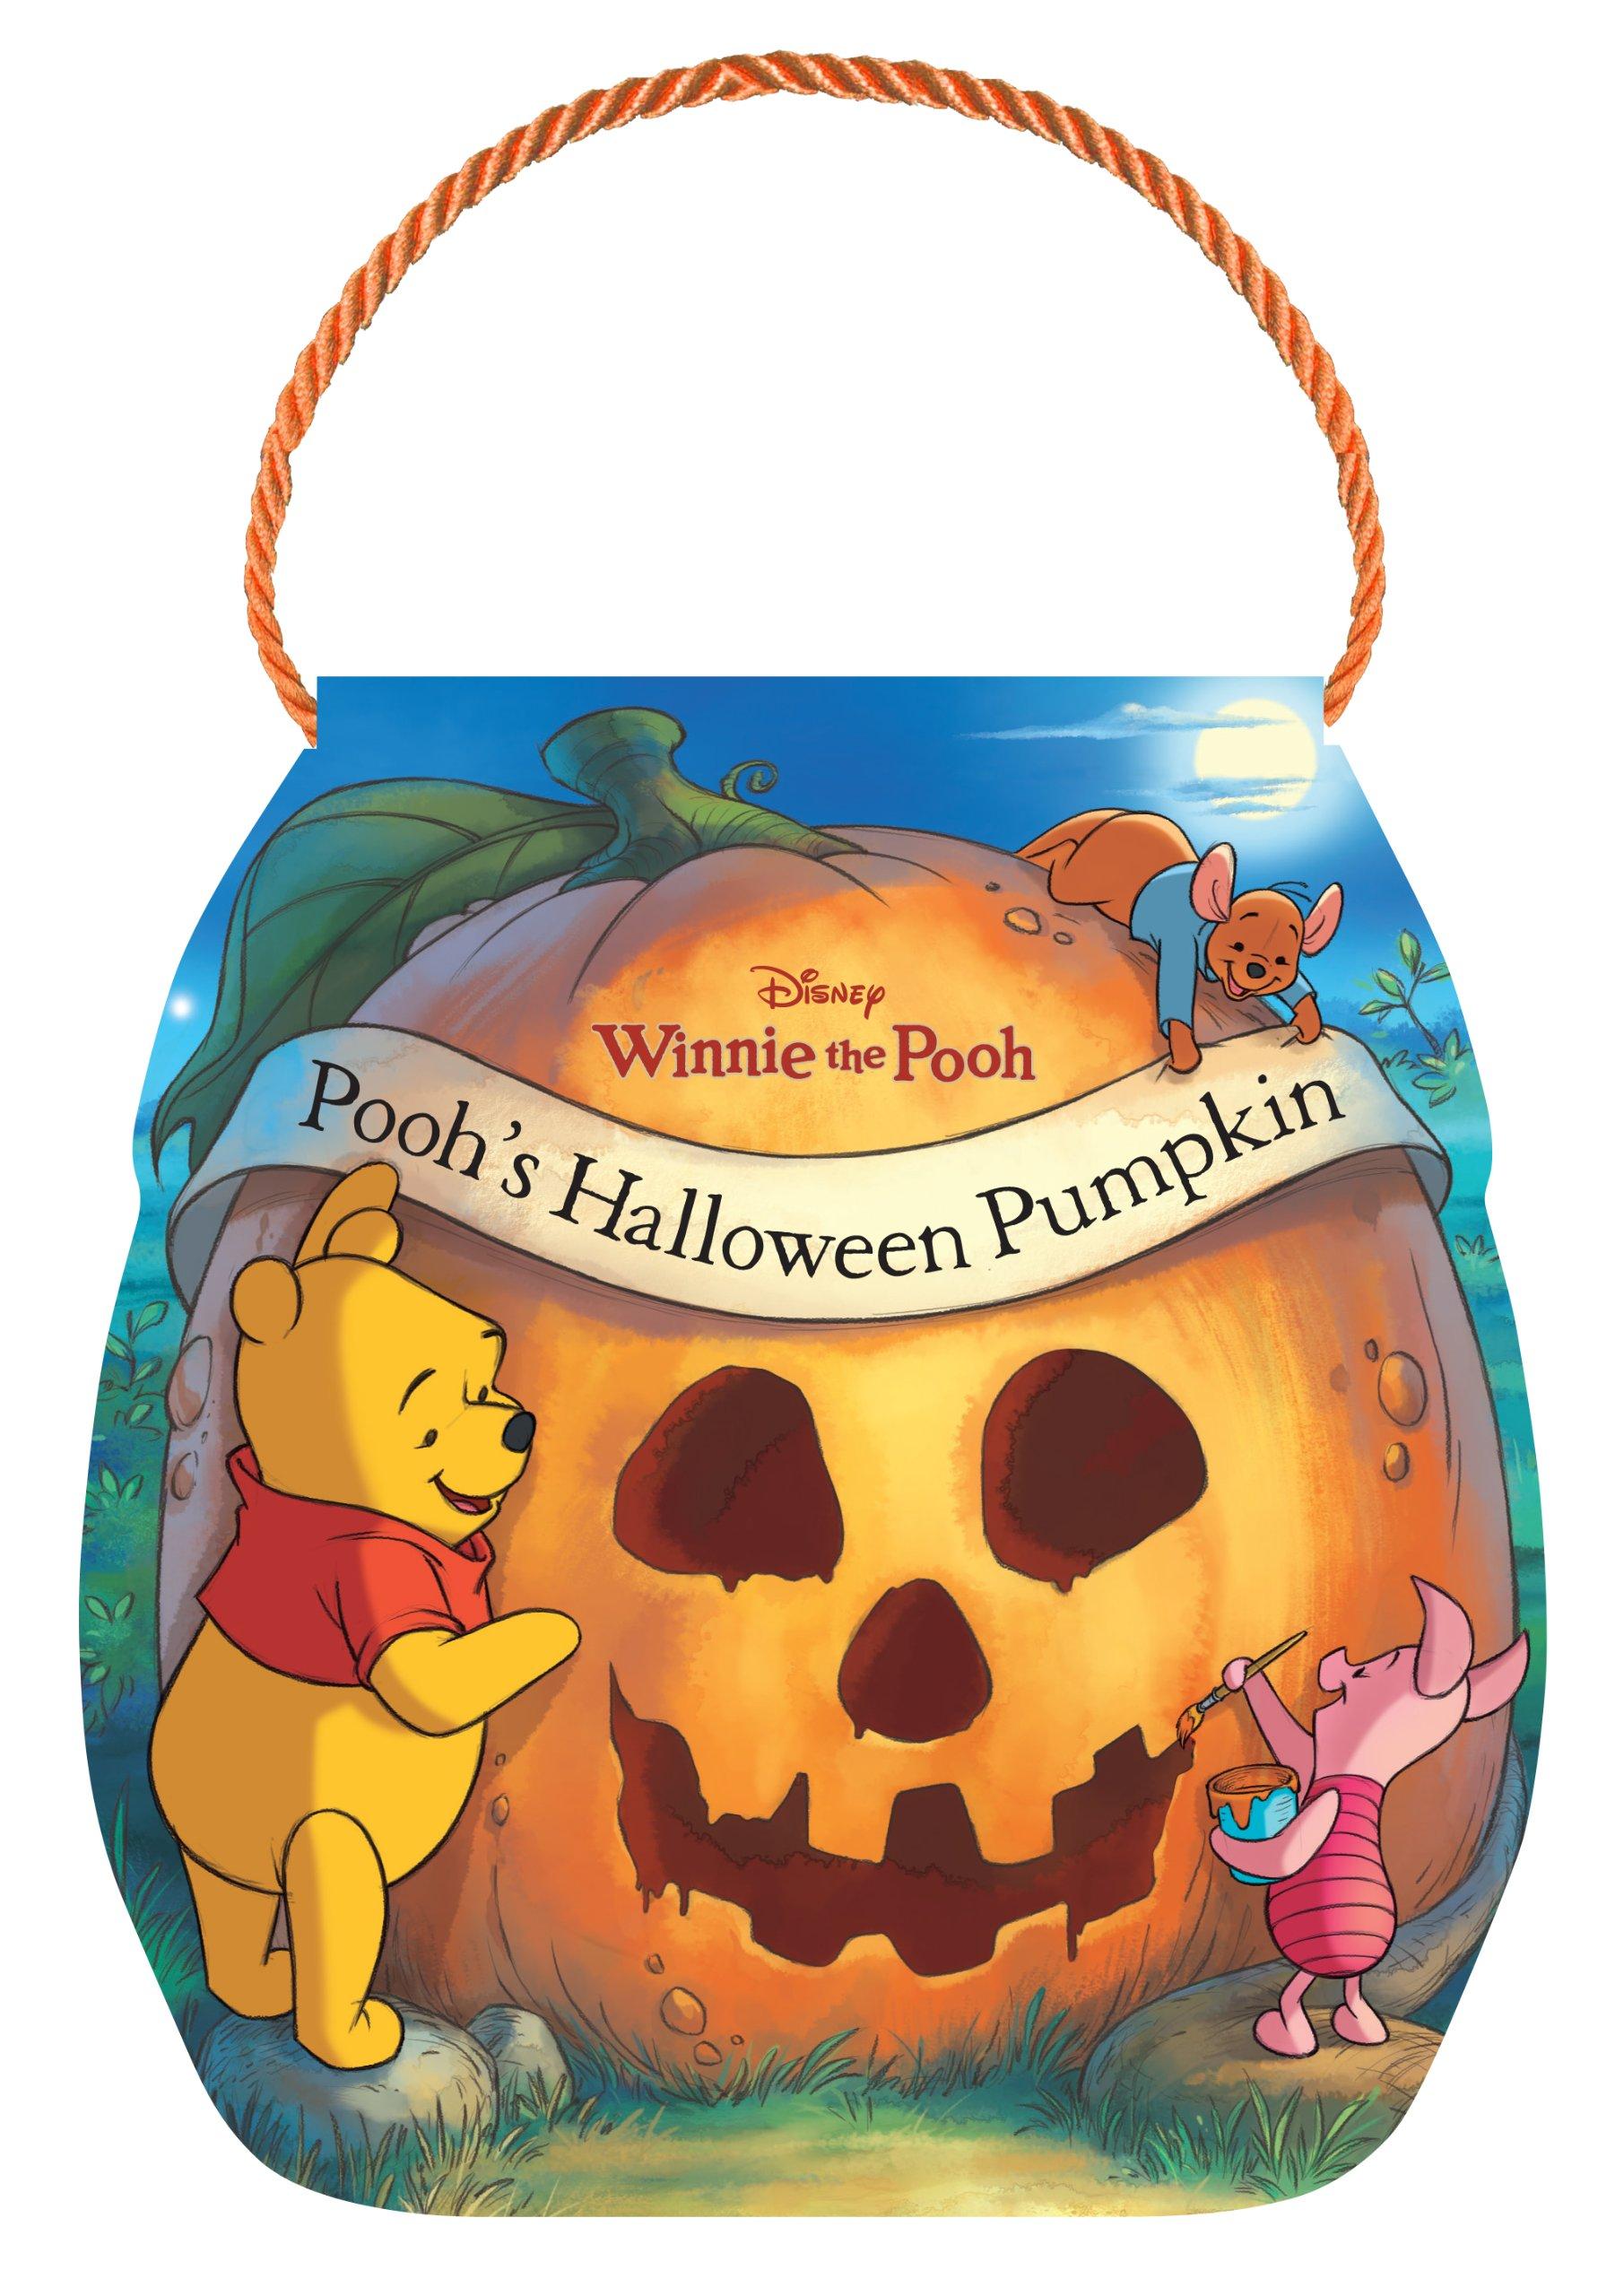 Pooh's Halloween Pumpkin | Disney Wiki | FANDOM powered by Wikia